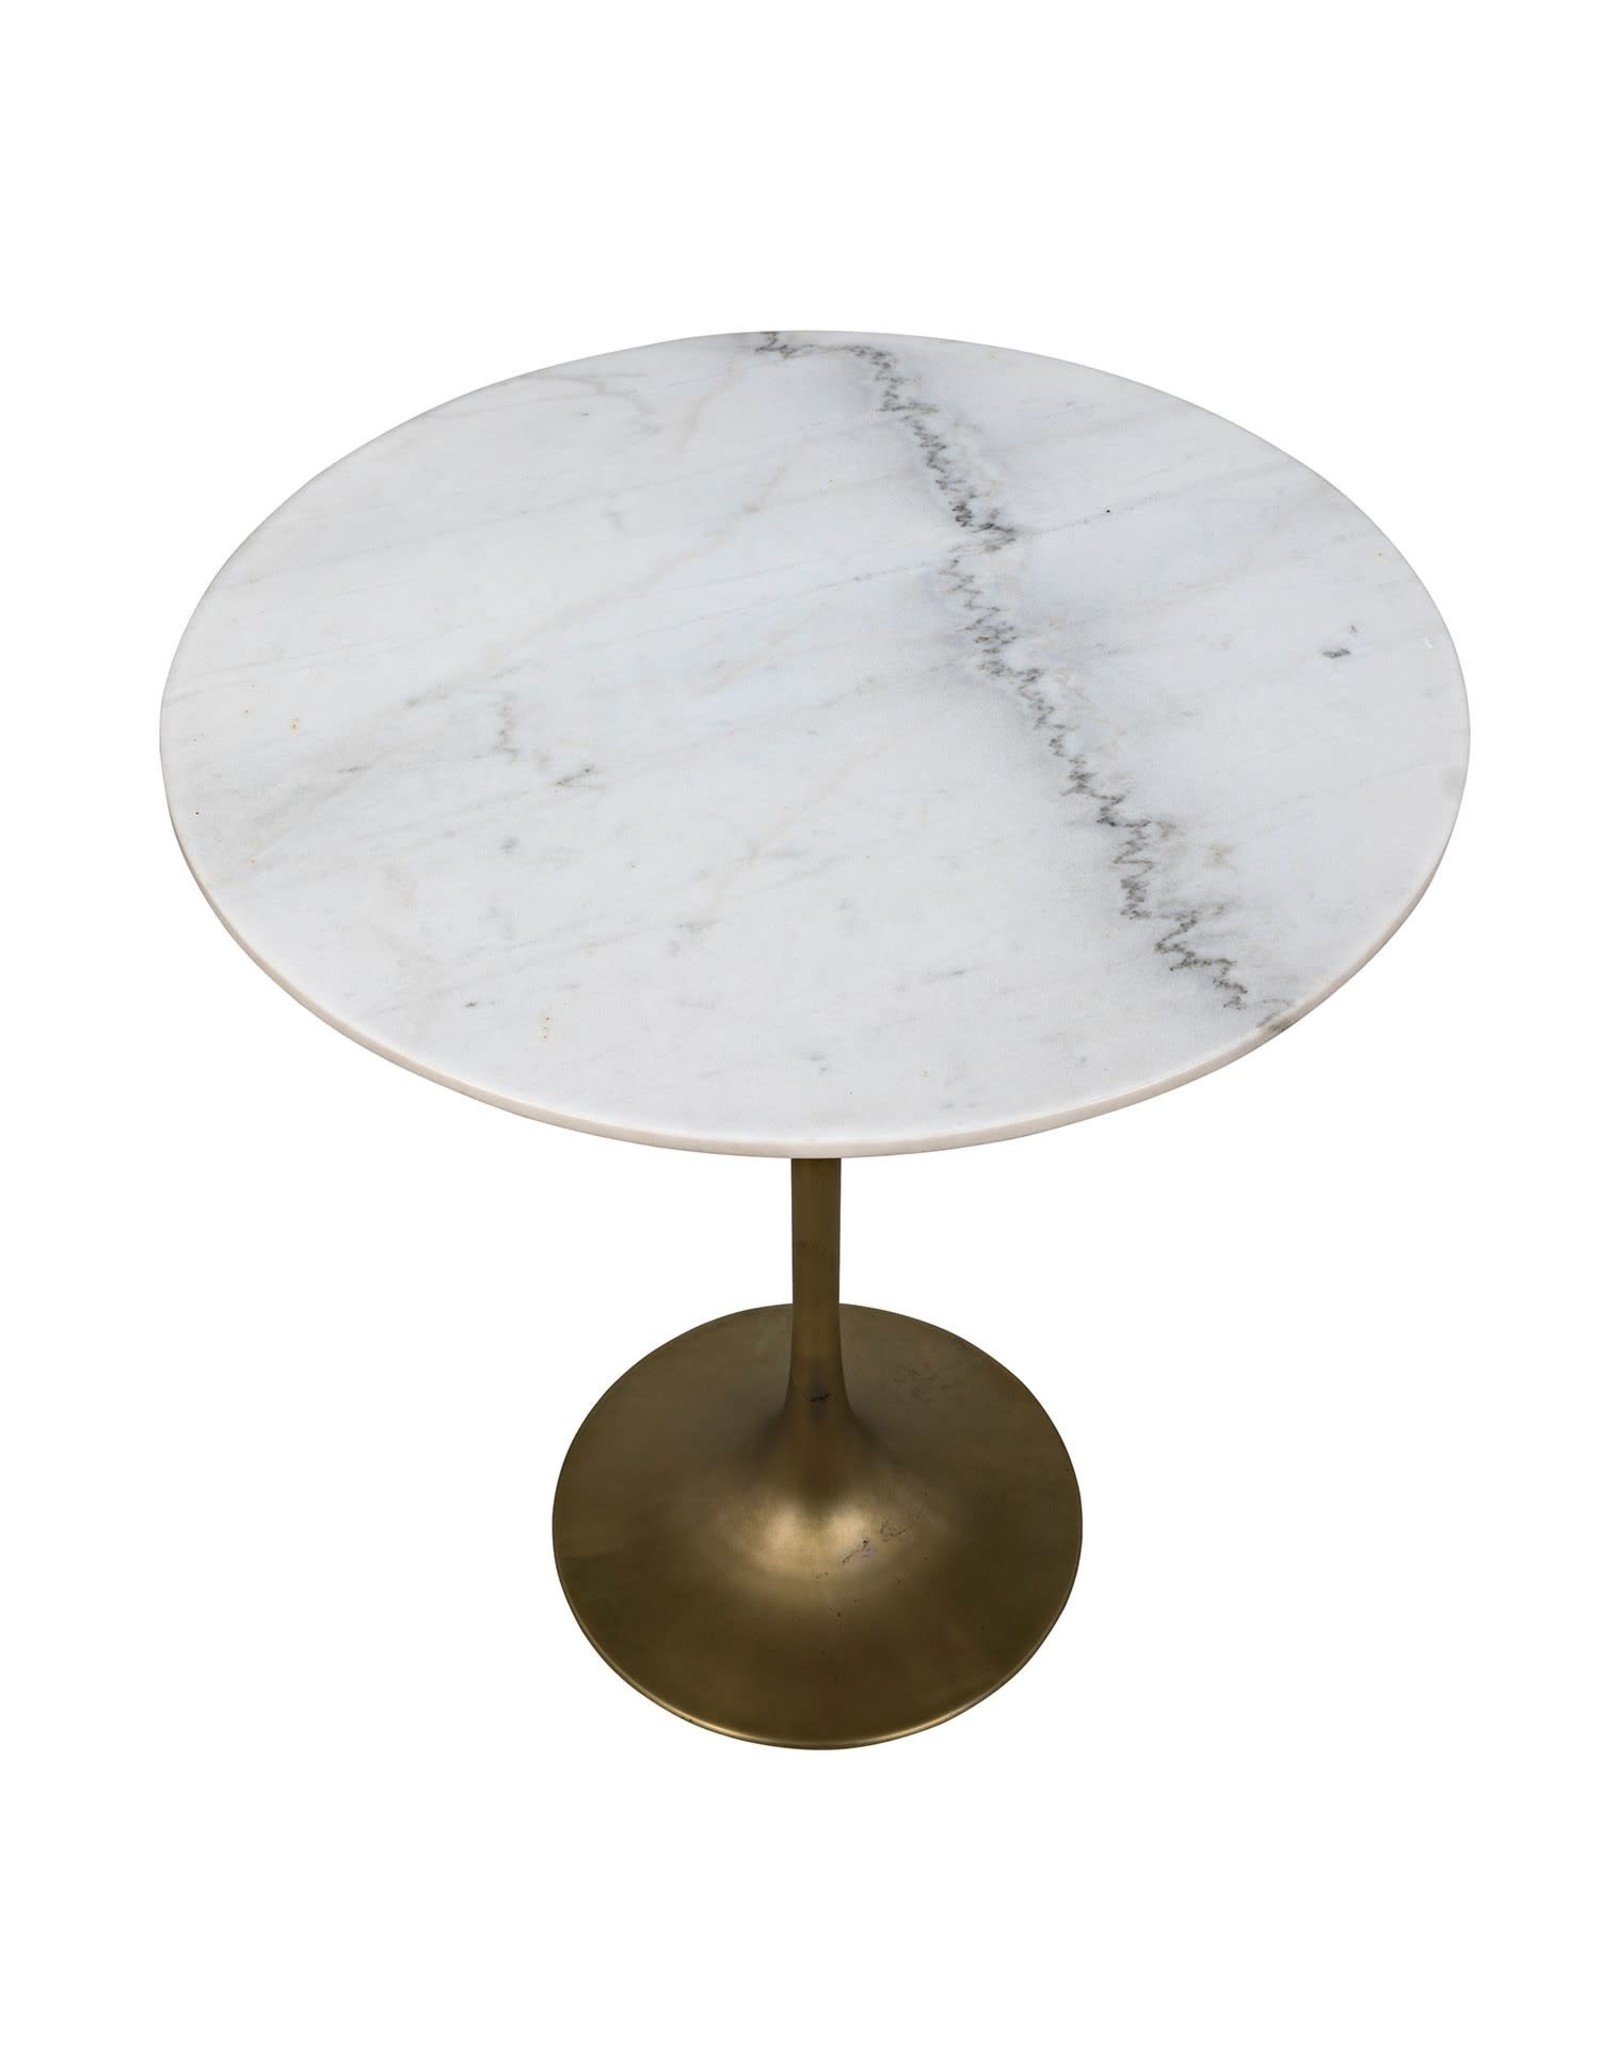 Website Noir Laredo Bar Table - Antique Brass and White Stone